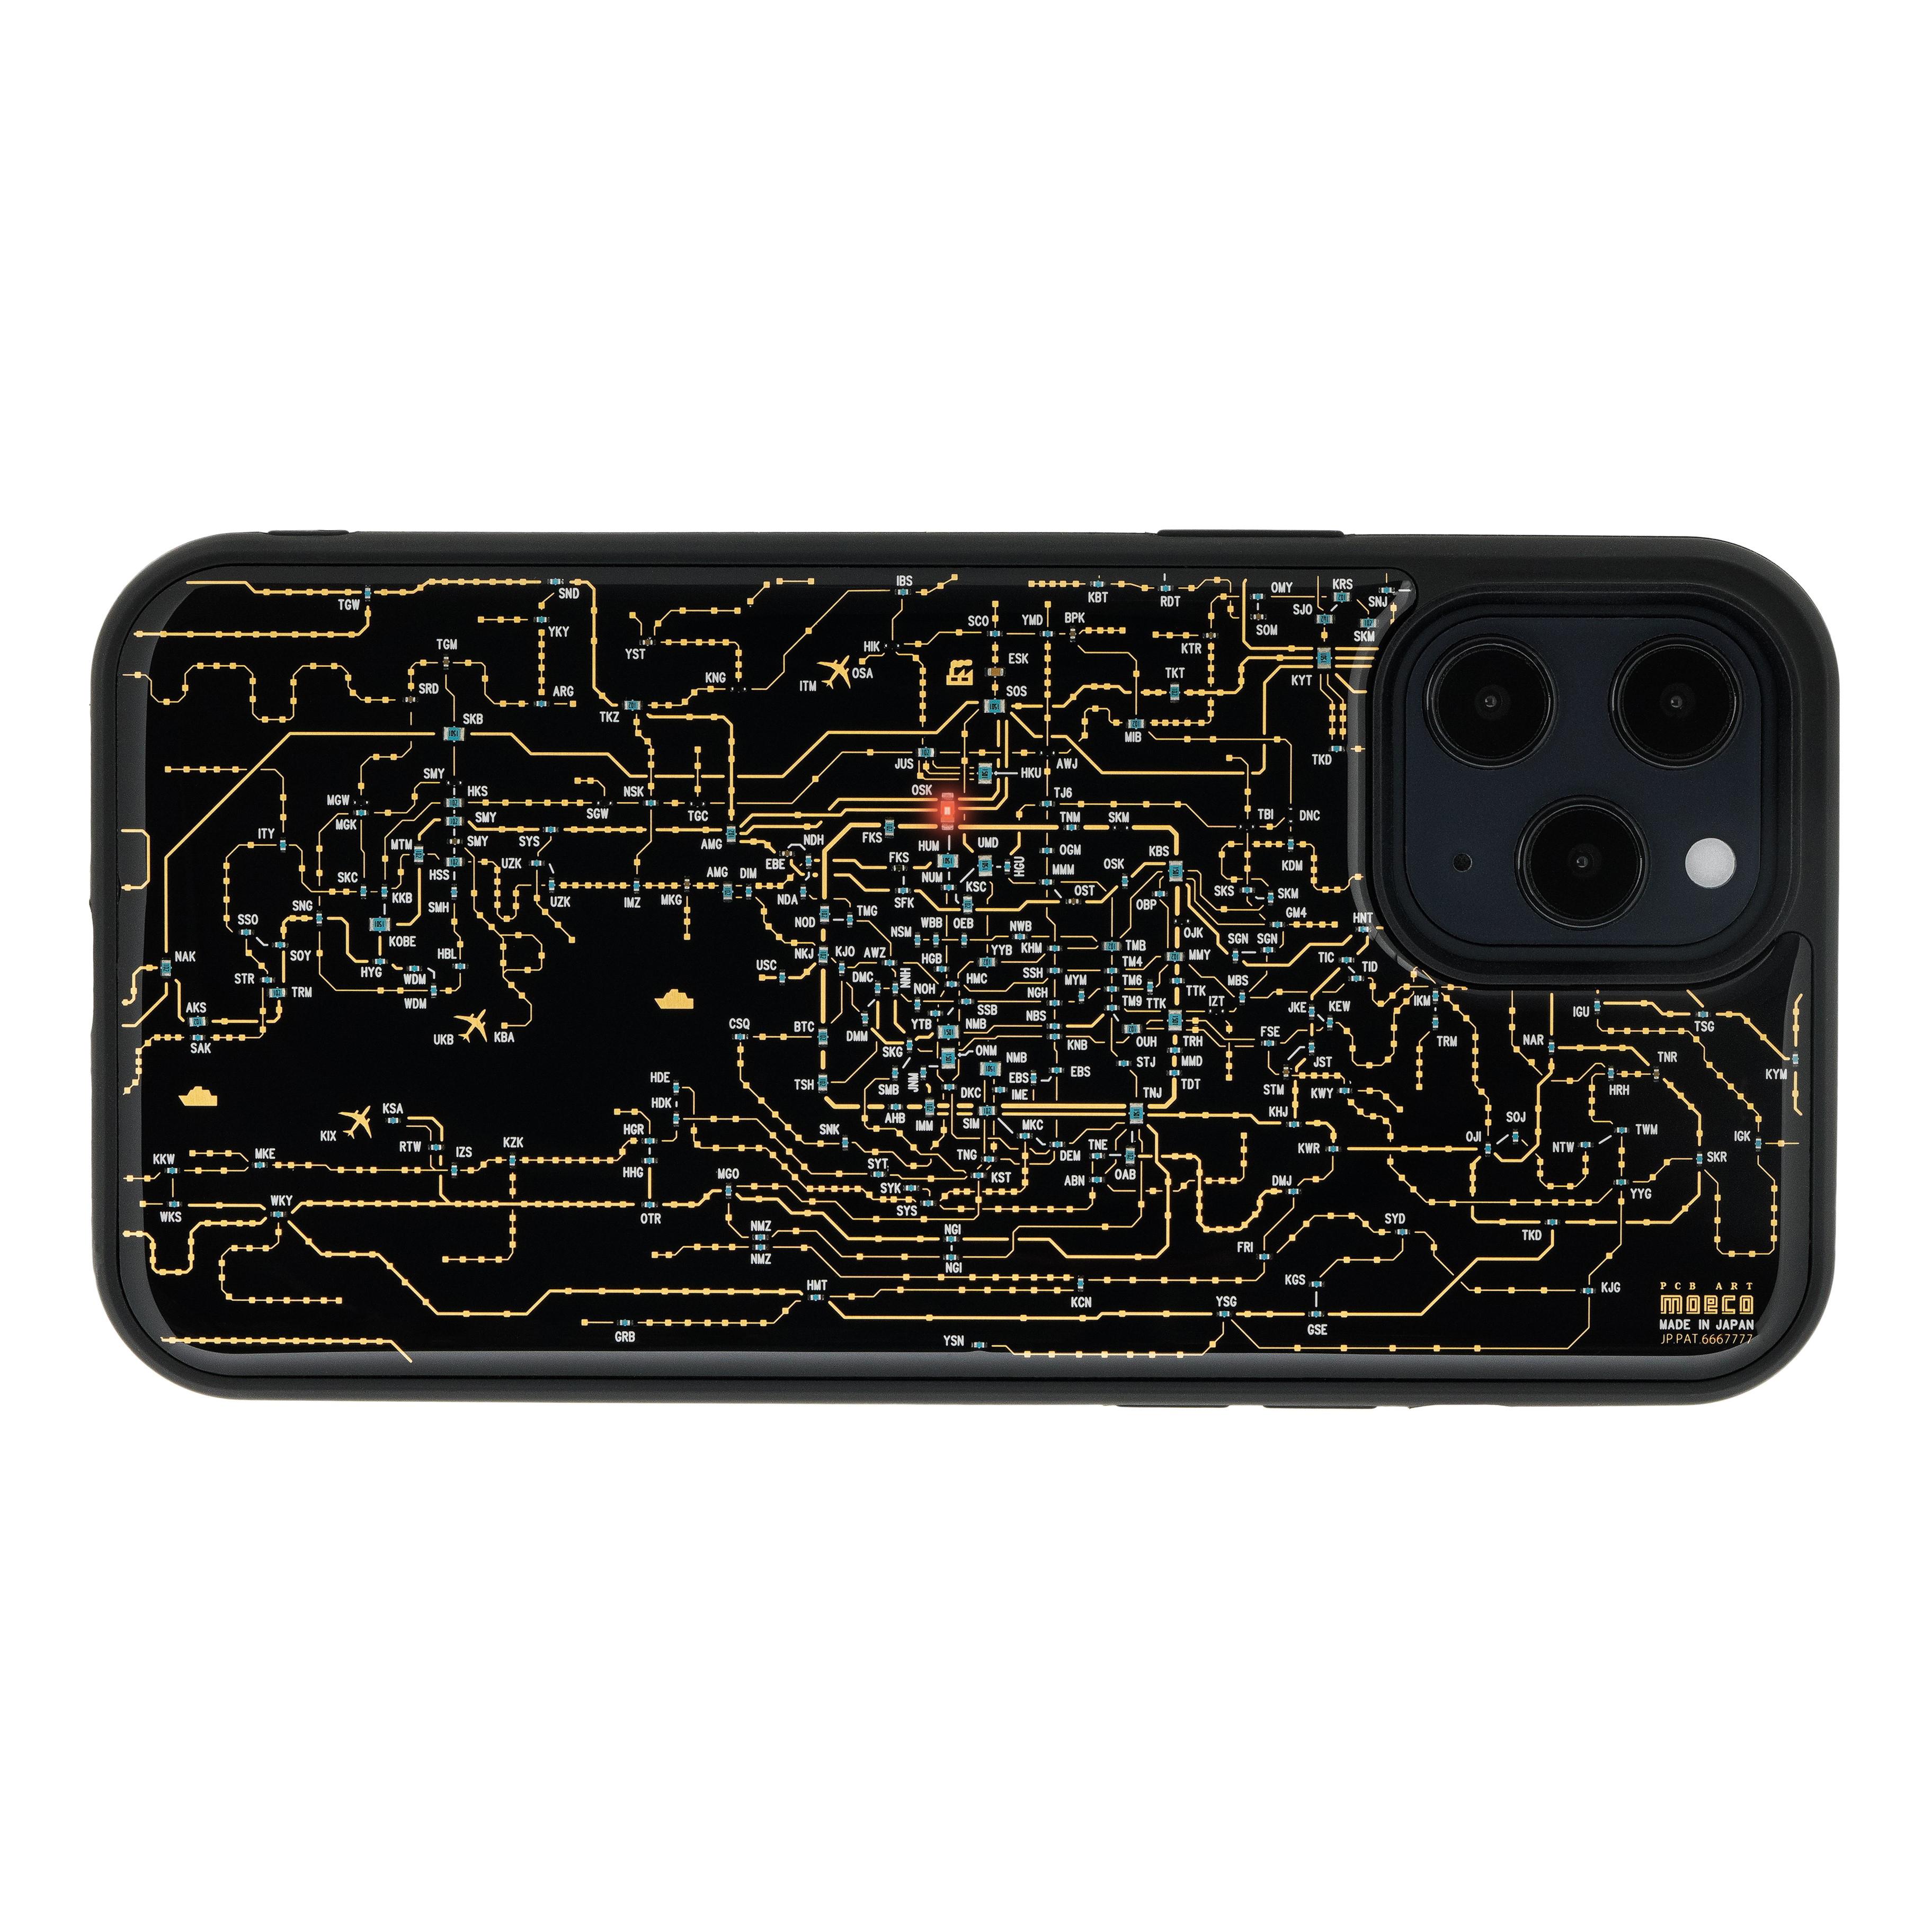 FLASH 関西回路線図 iPhone 12 Pro Max ケース  黒【東京回路線図A5クリアファイルをプレゼント】